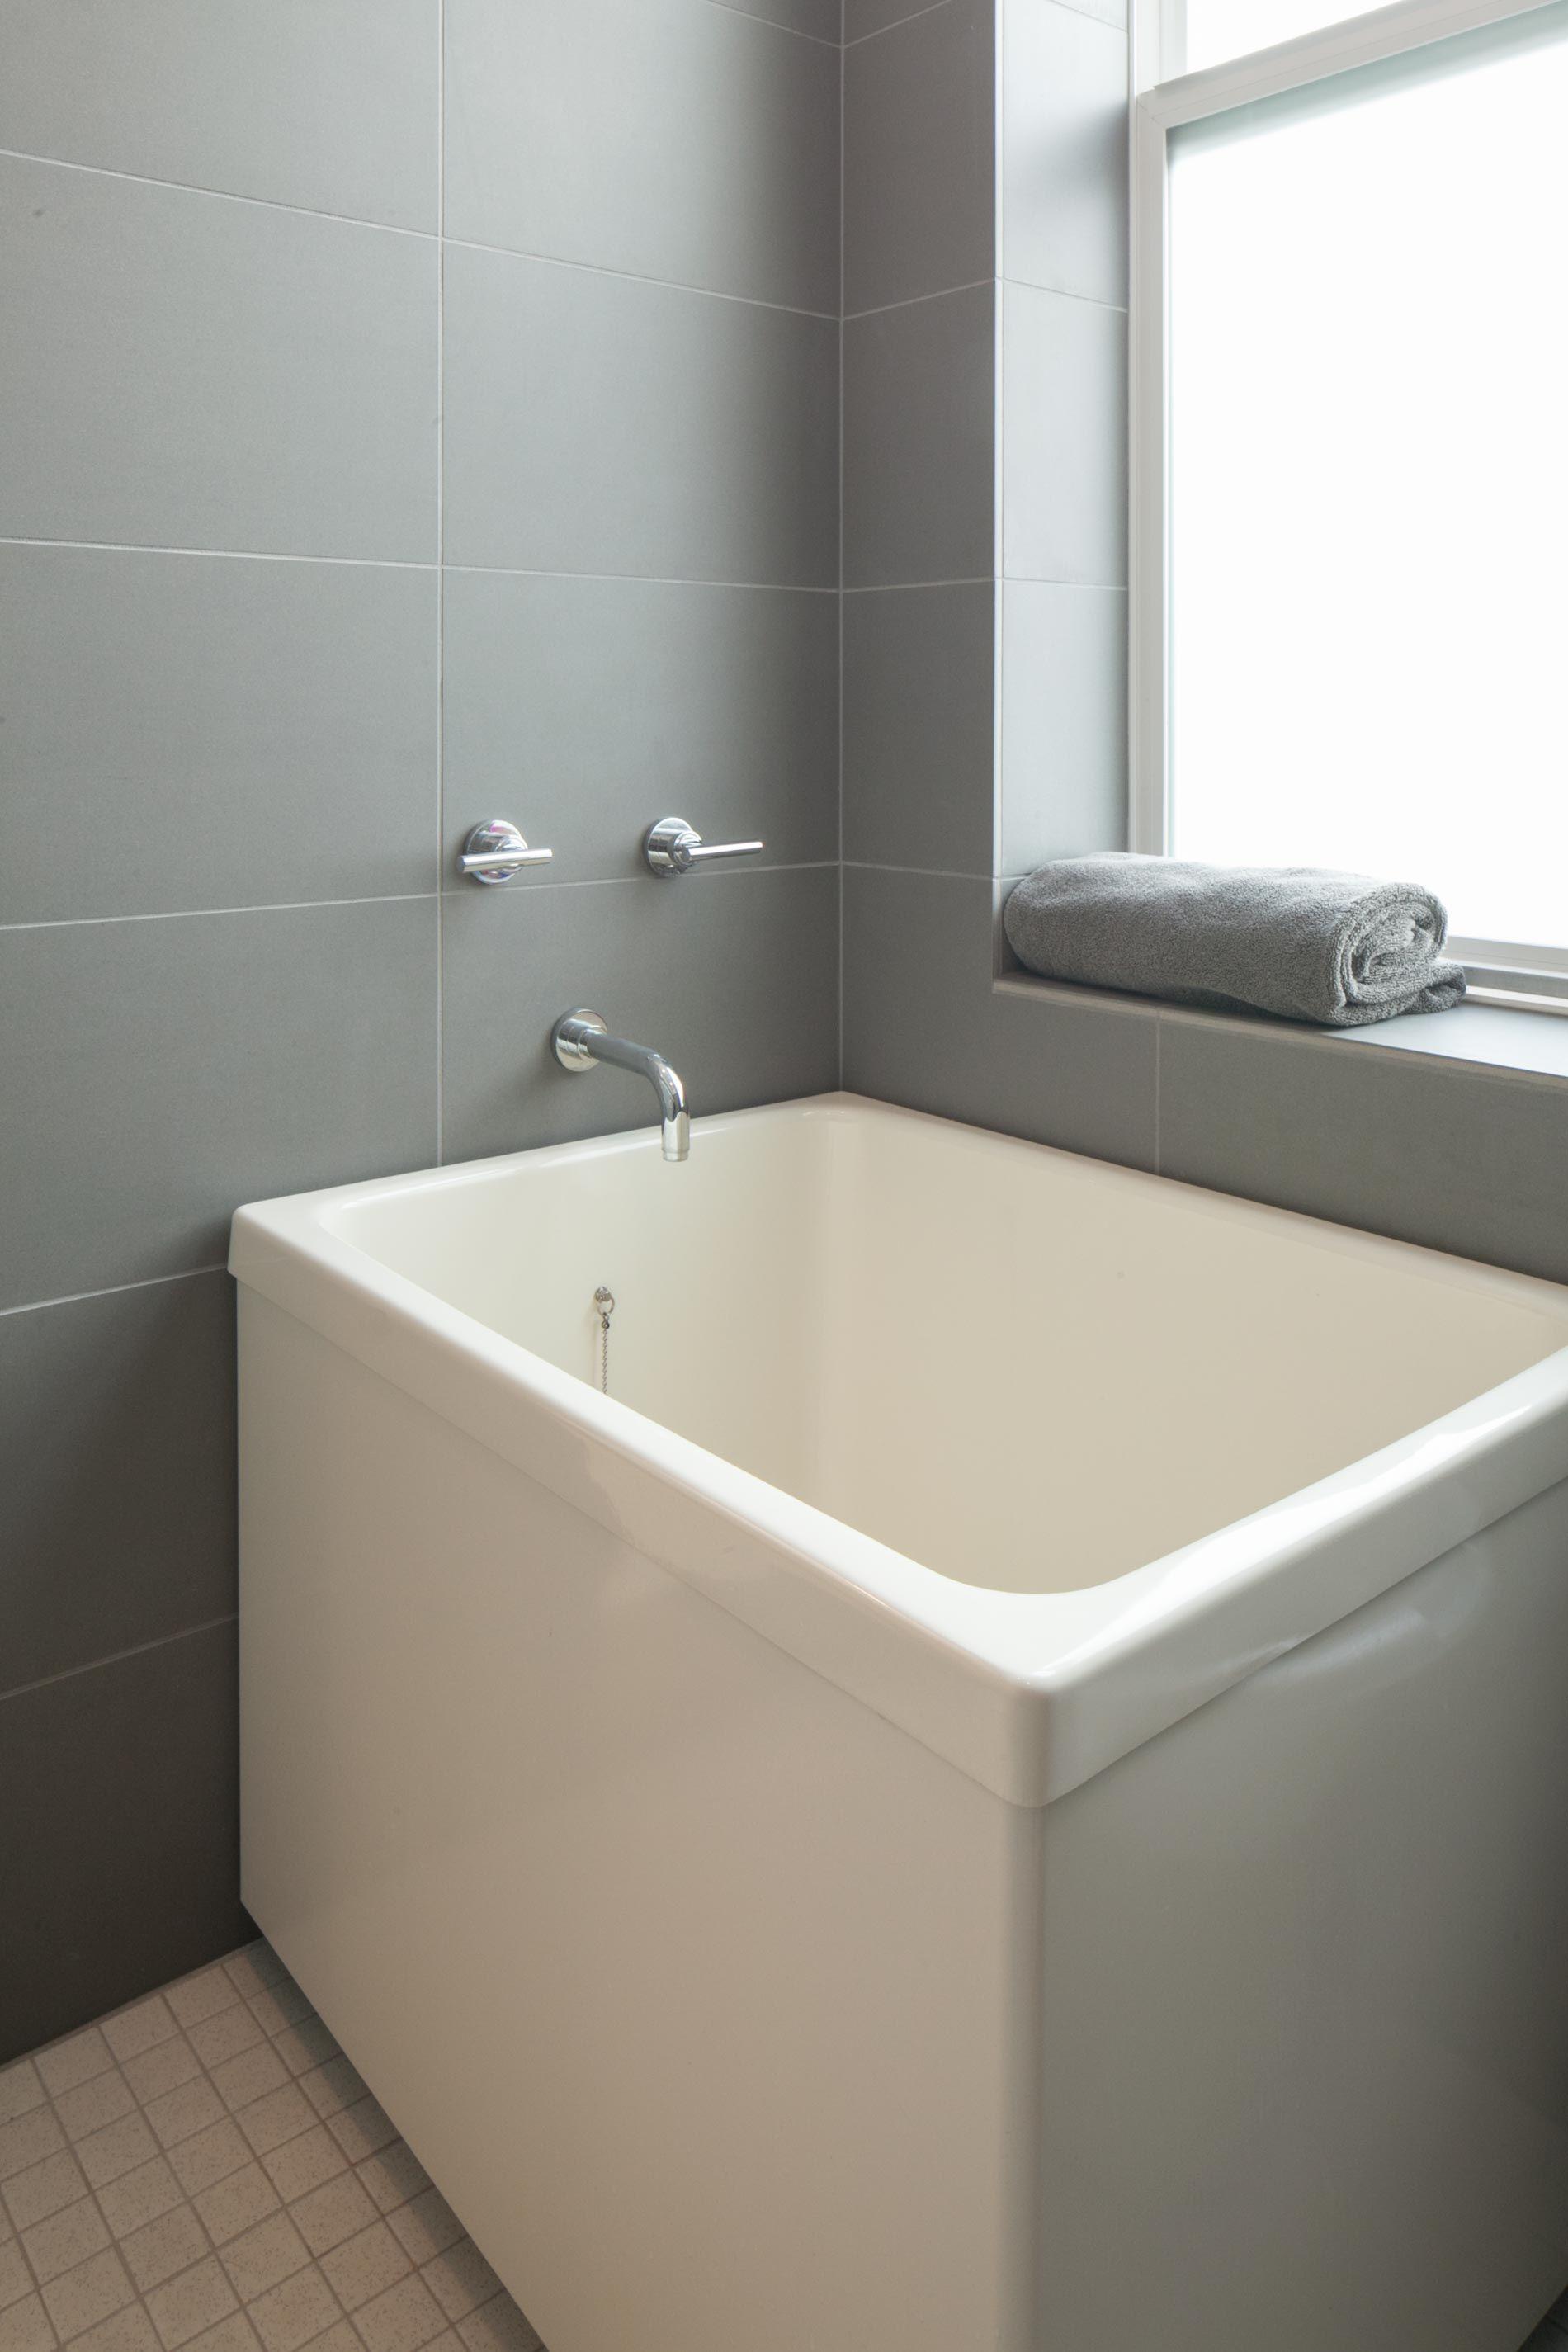 Toto Toilet Bidet Combo Price